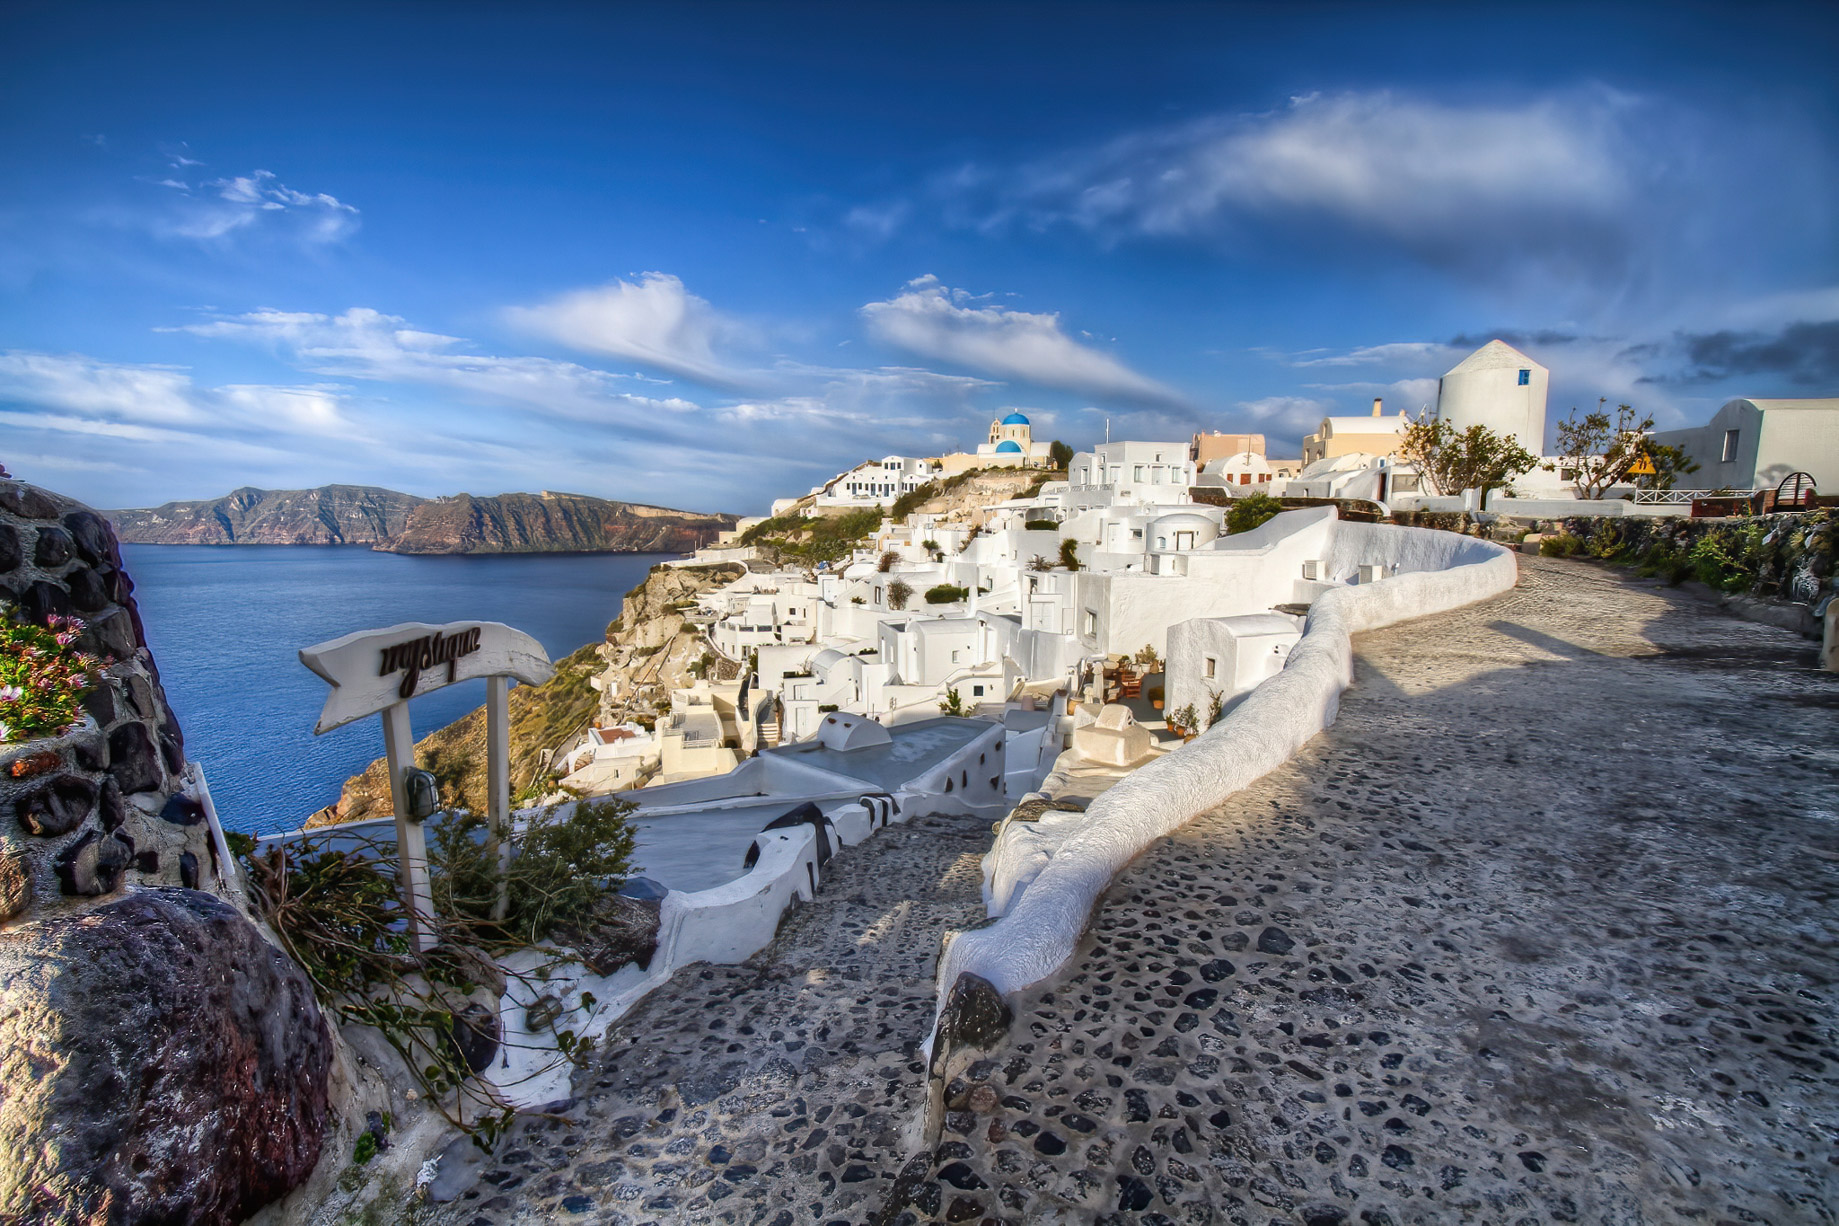 Mystique Luxury Hotel Santorini – Oia, Santorini Island, Greece